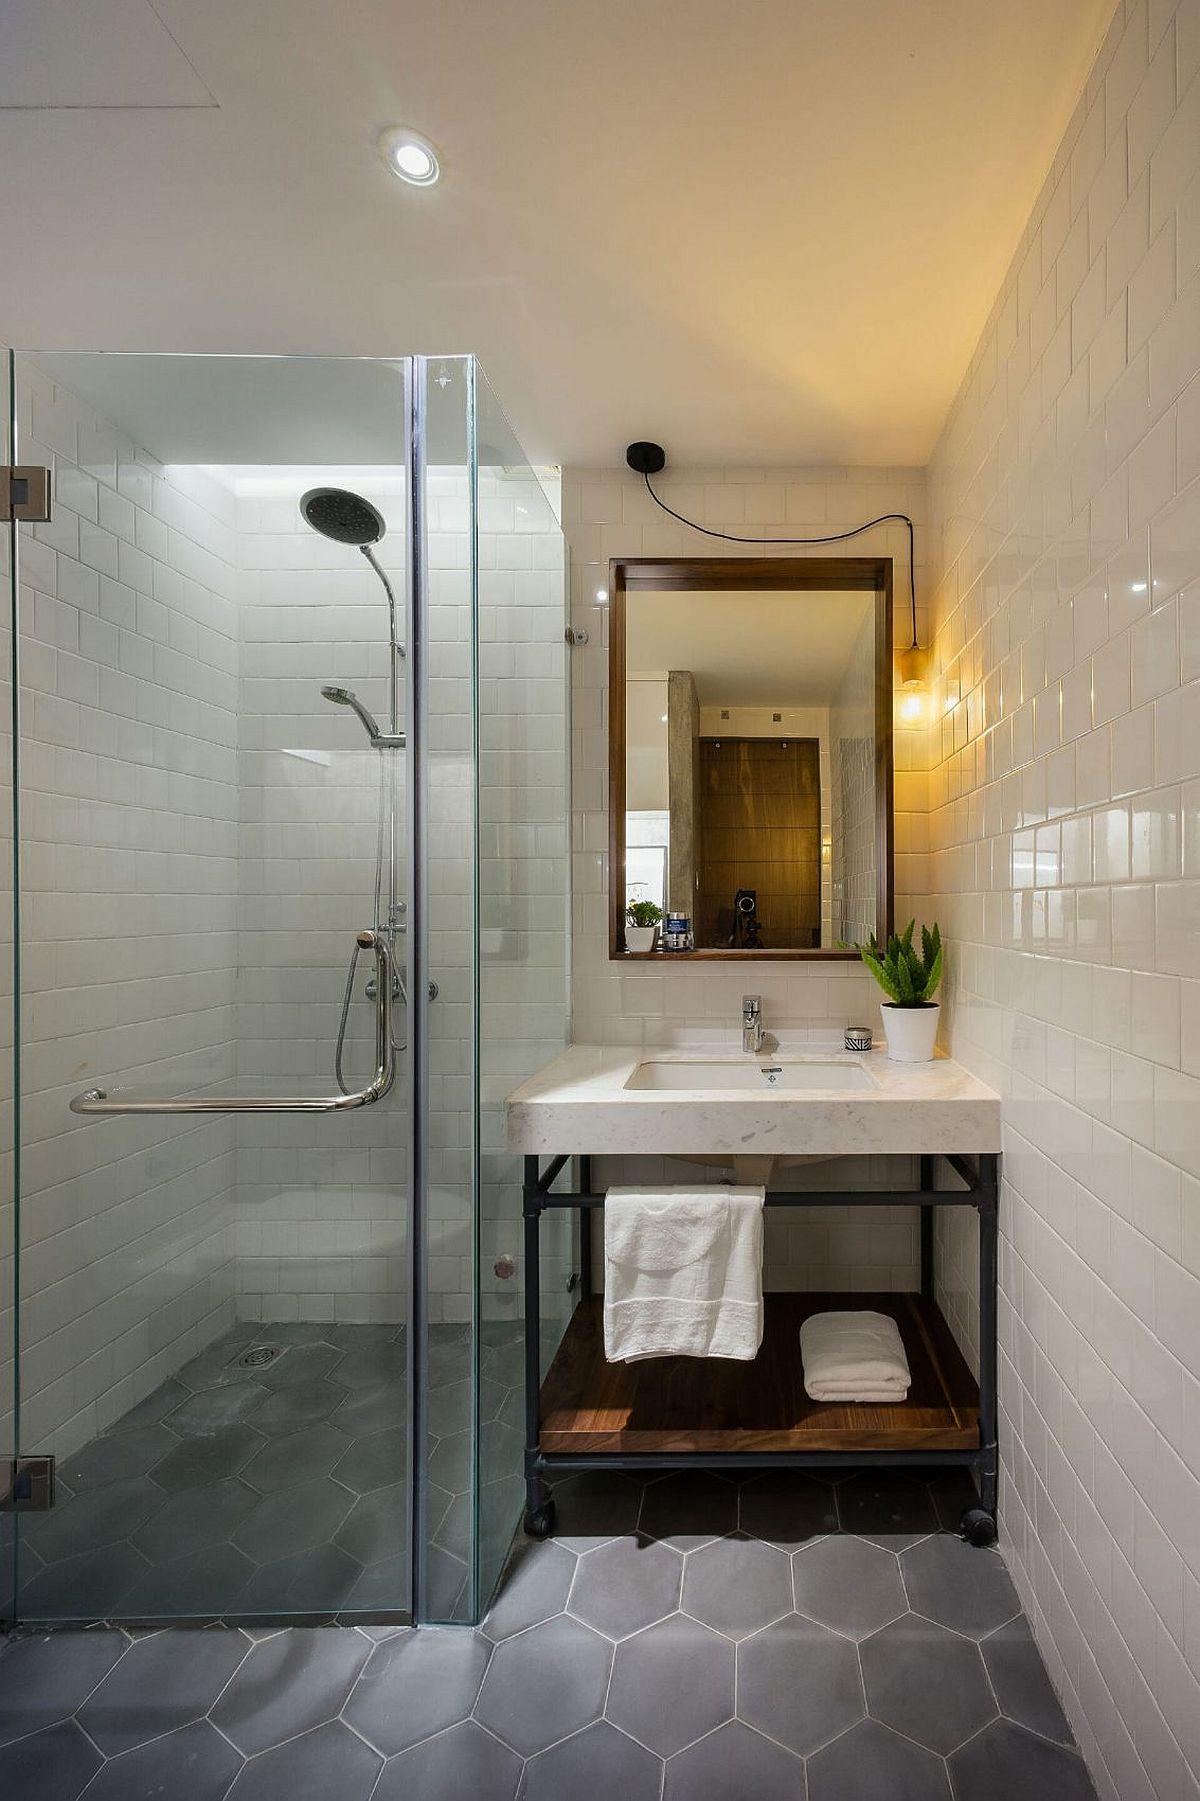 Hexagonal floor tiles bring geometric beauty to the small bathroom